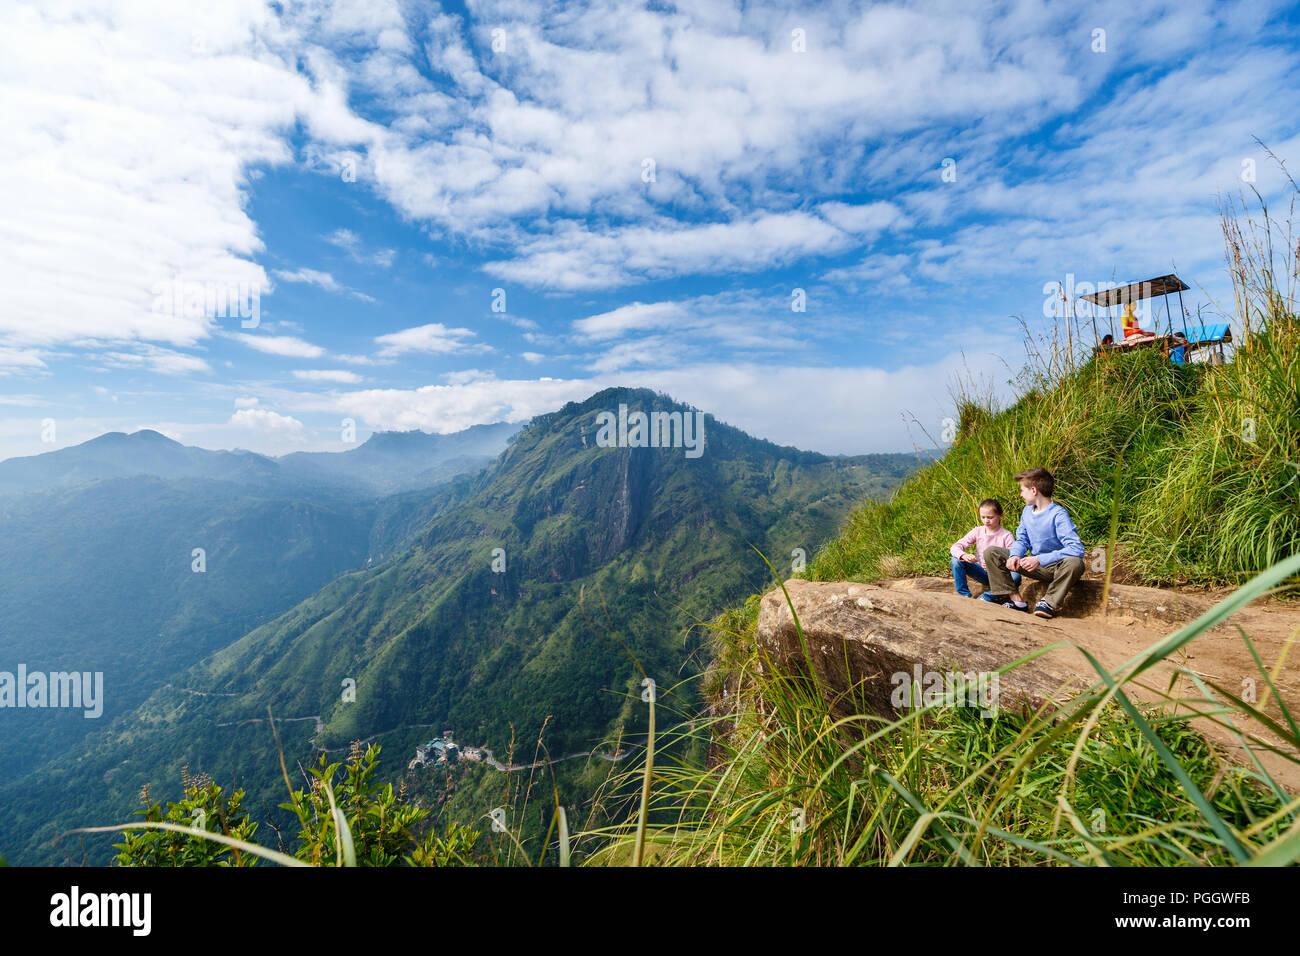 af77d162f Kids enjoying breathtaking views over mountains and tea plantations from Little  Adams peak in Ella Sri Lanka